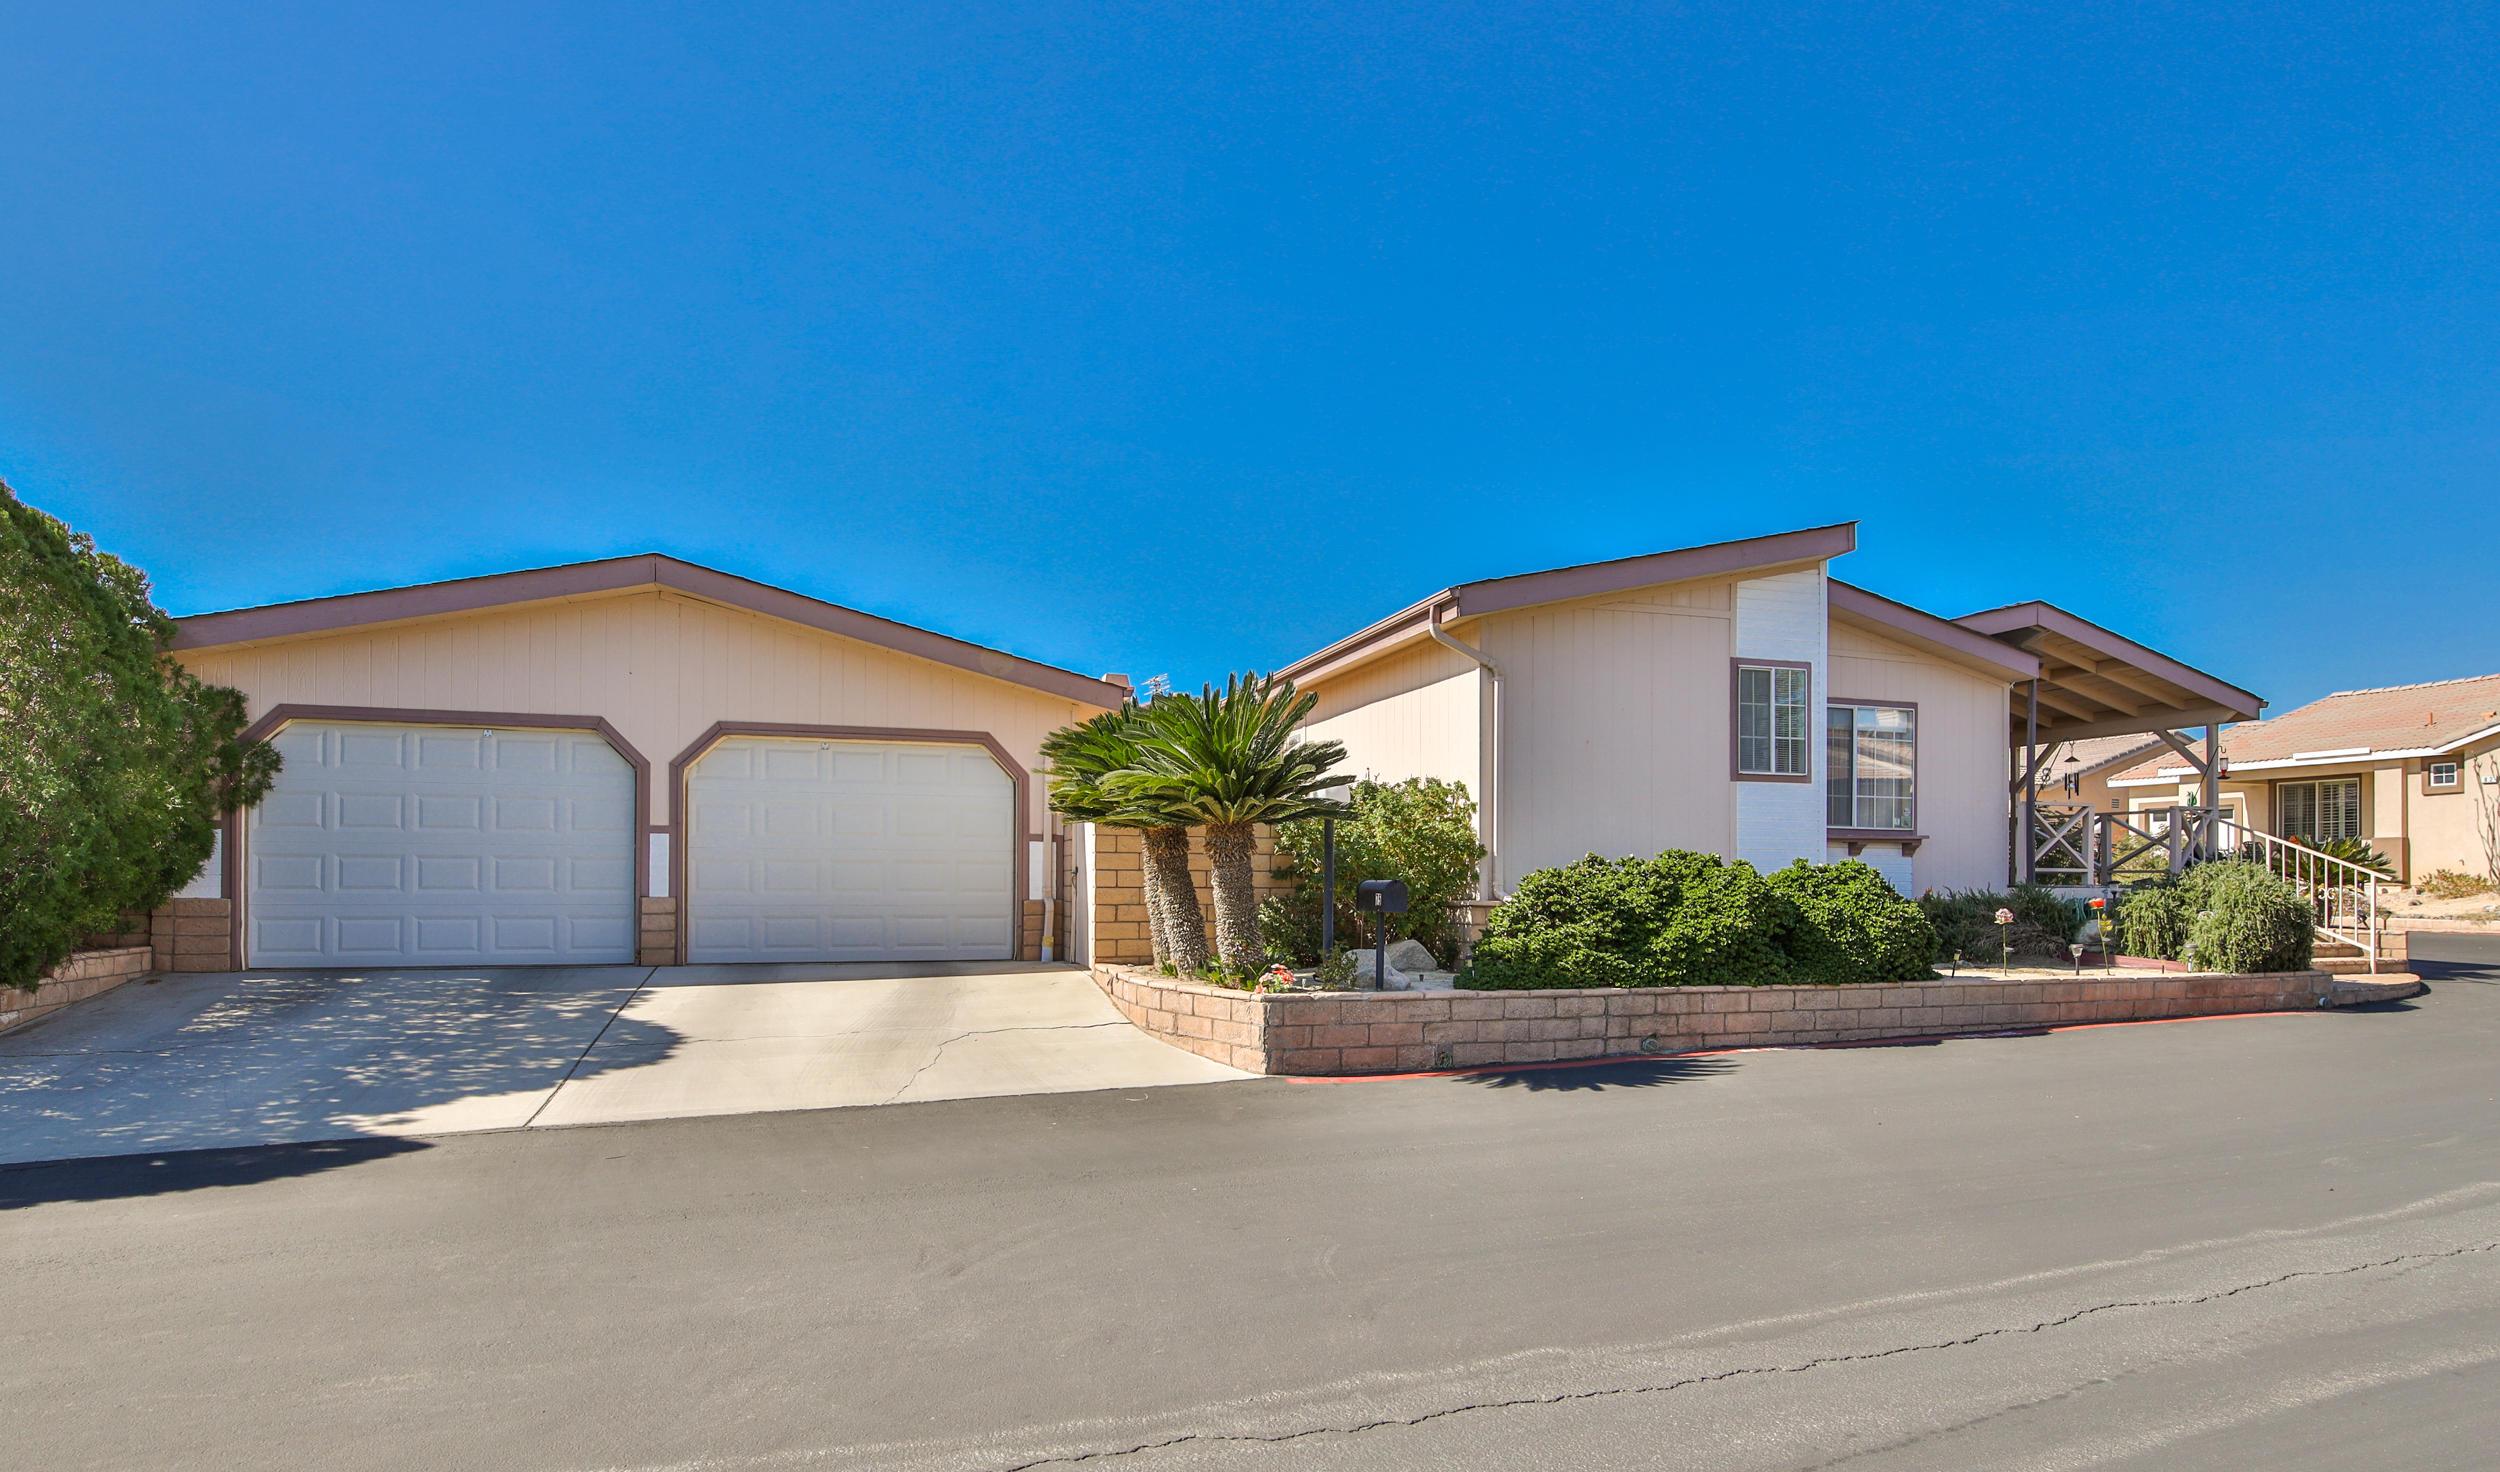 Photo of 65565 Acoma Avenue #75, Desert Hot Springs, CA 92240